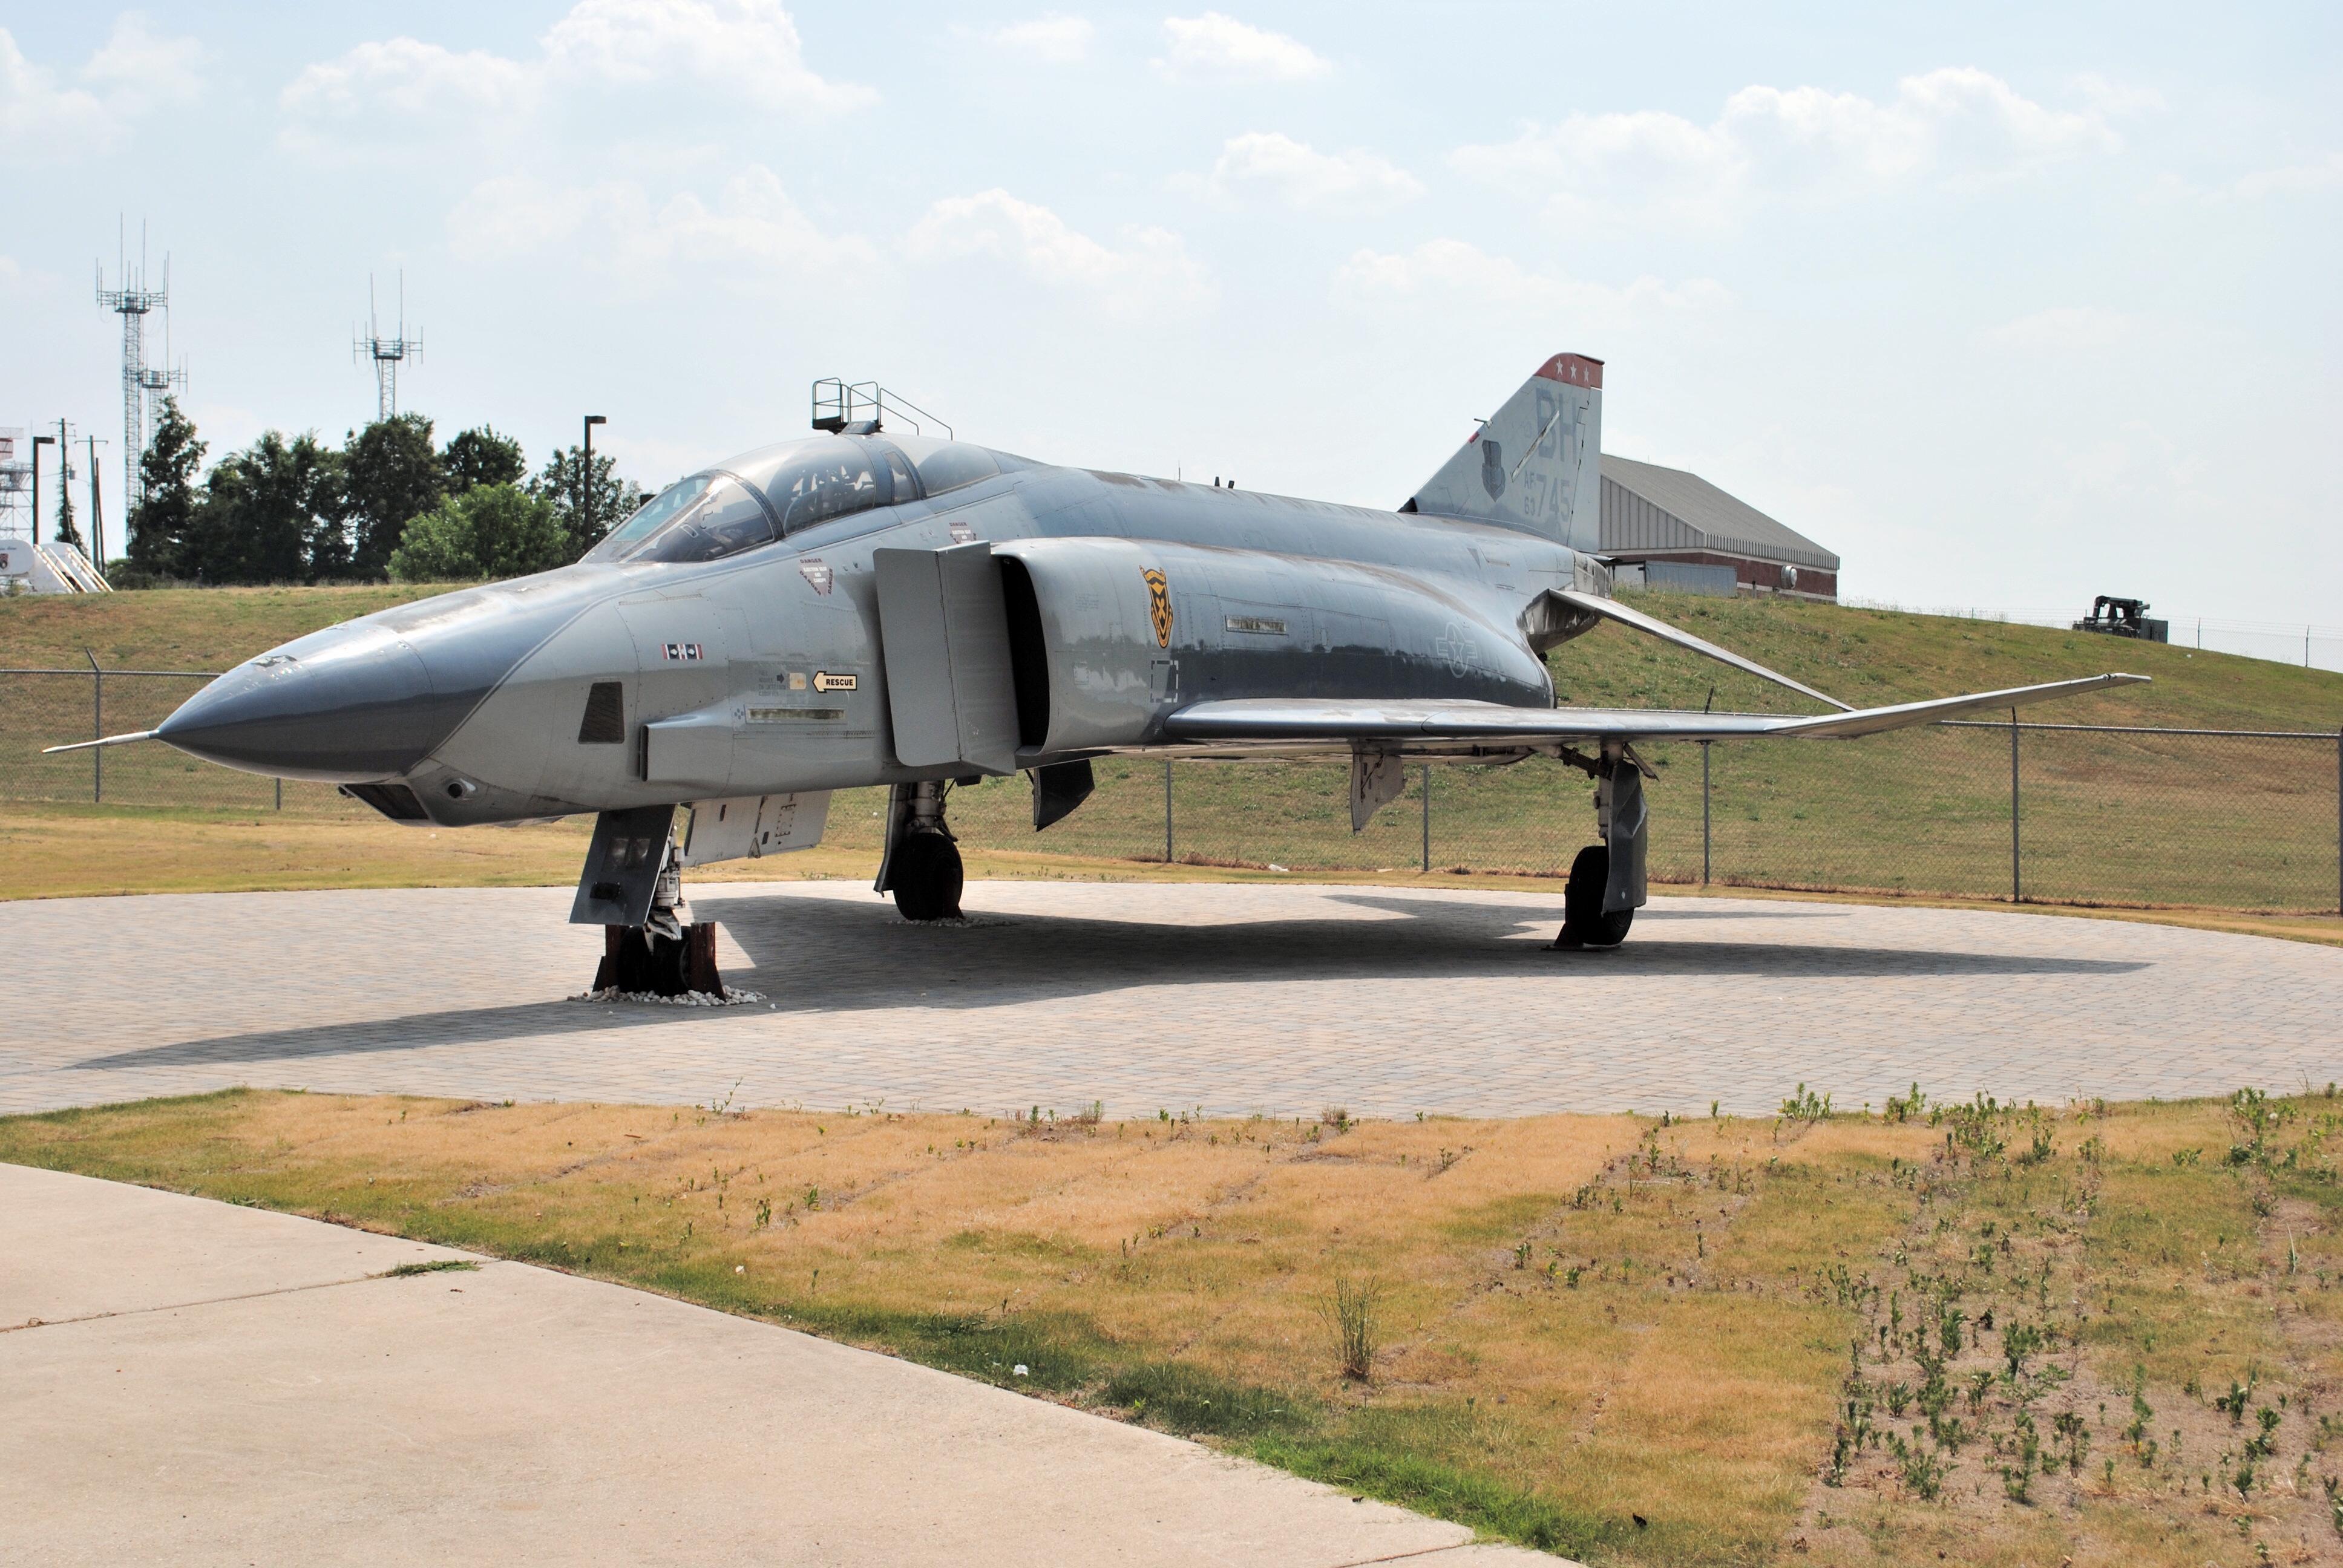 File:RF-4C Phantom outside of Alabama Air National Guard